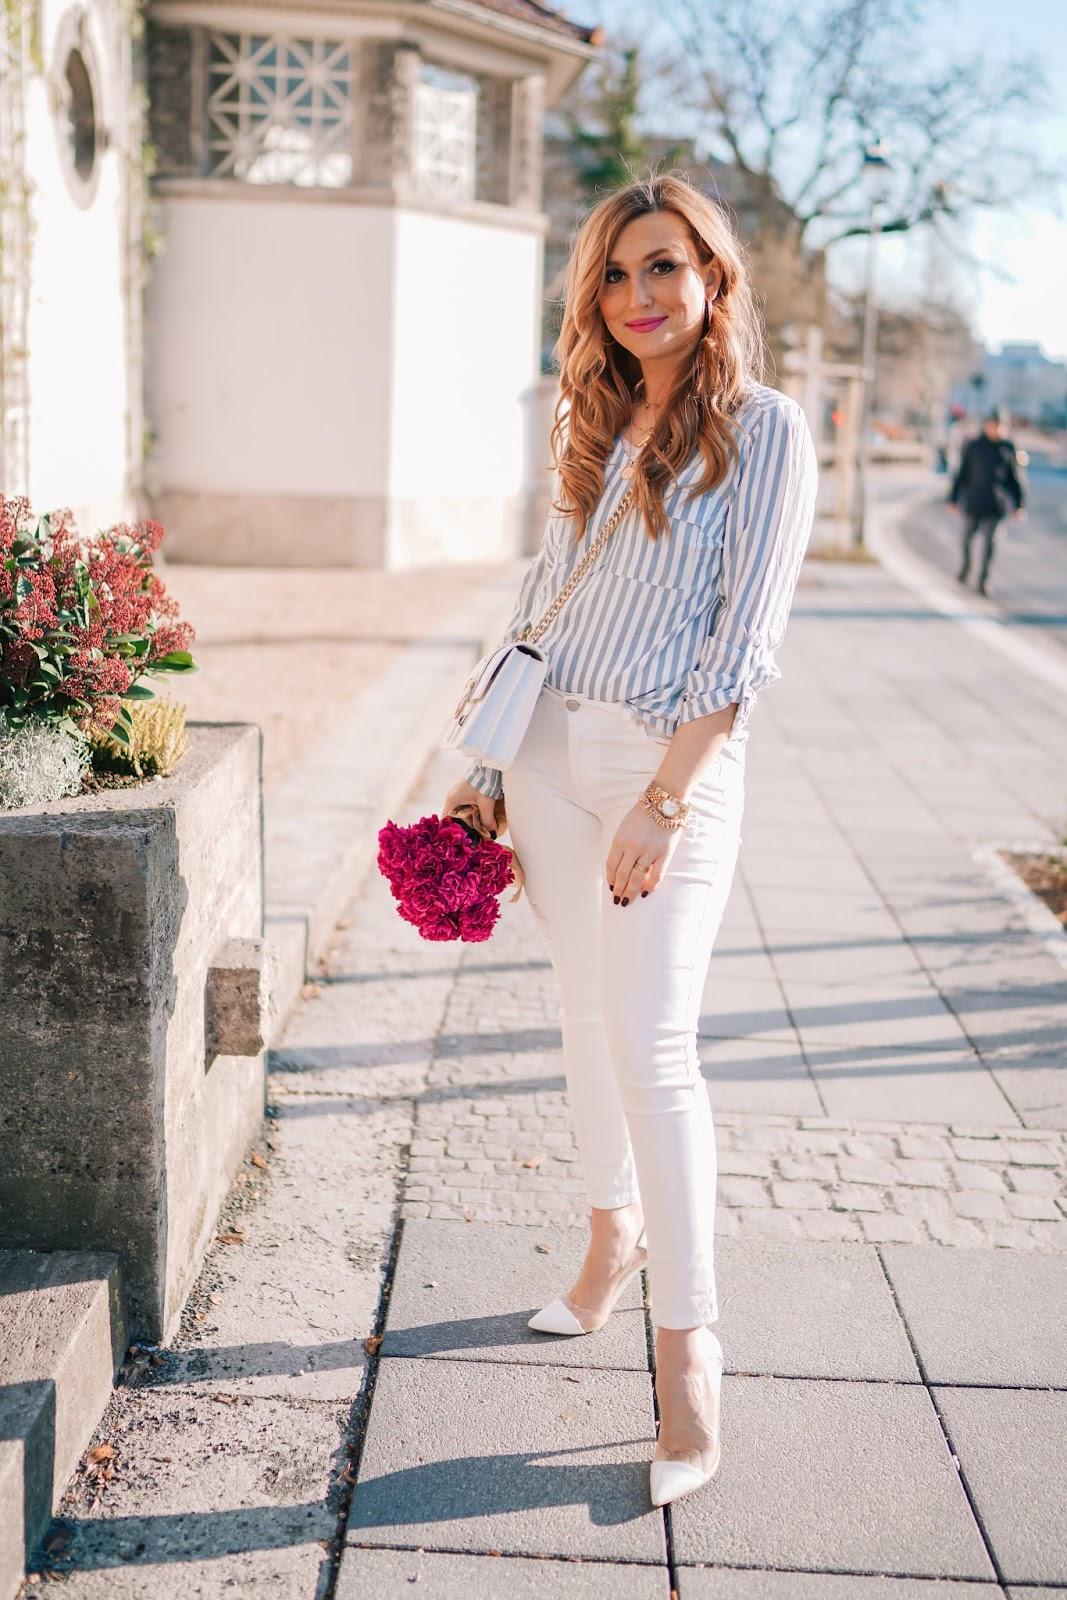 gestreifte-bluse-blau-gestreifte-bluse-frühlingsoutfit-springoutfit-weiße-pumps-weiße-jeans-fashionstylebyjohanna (3)